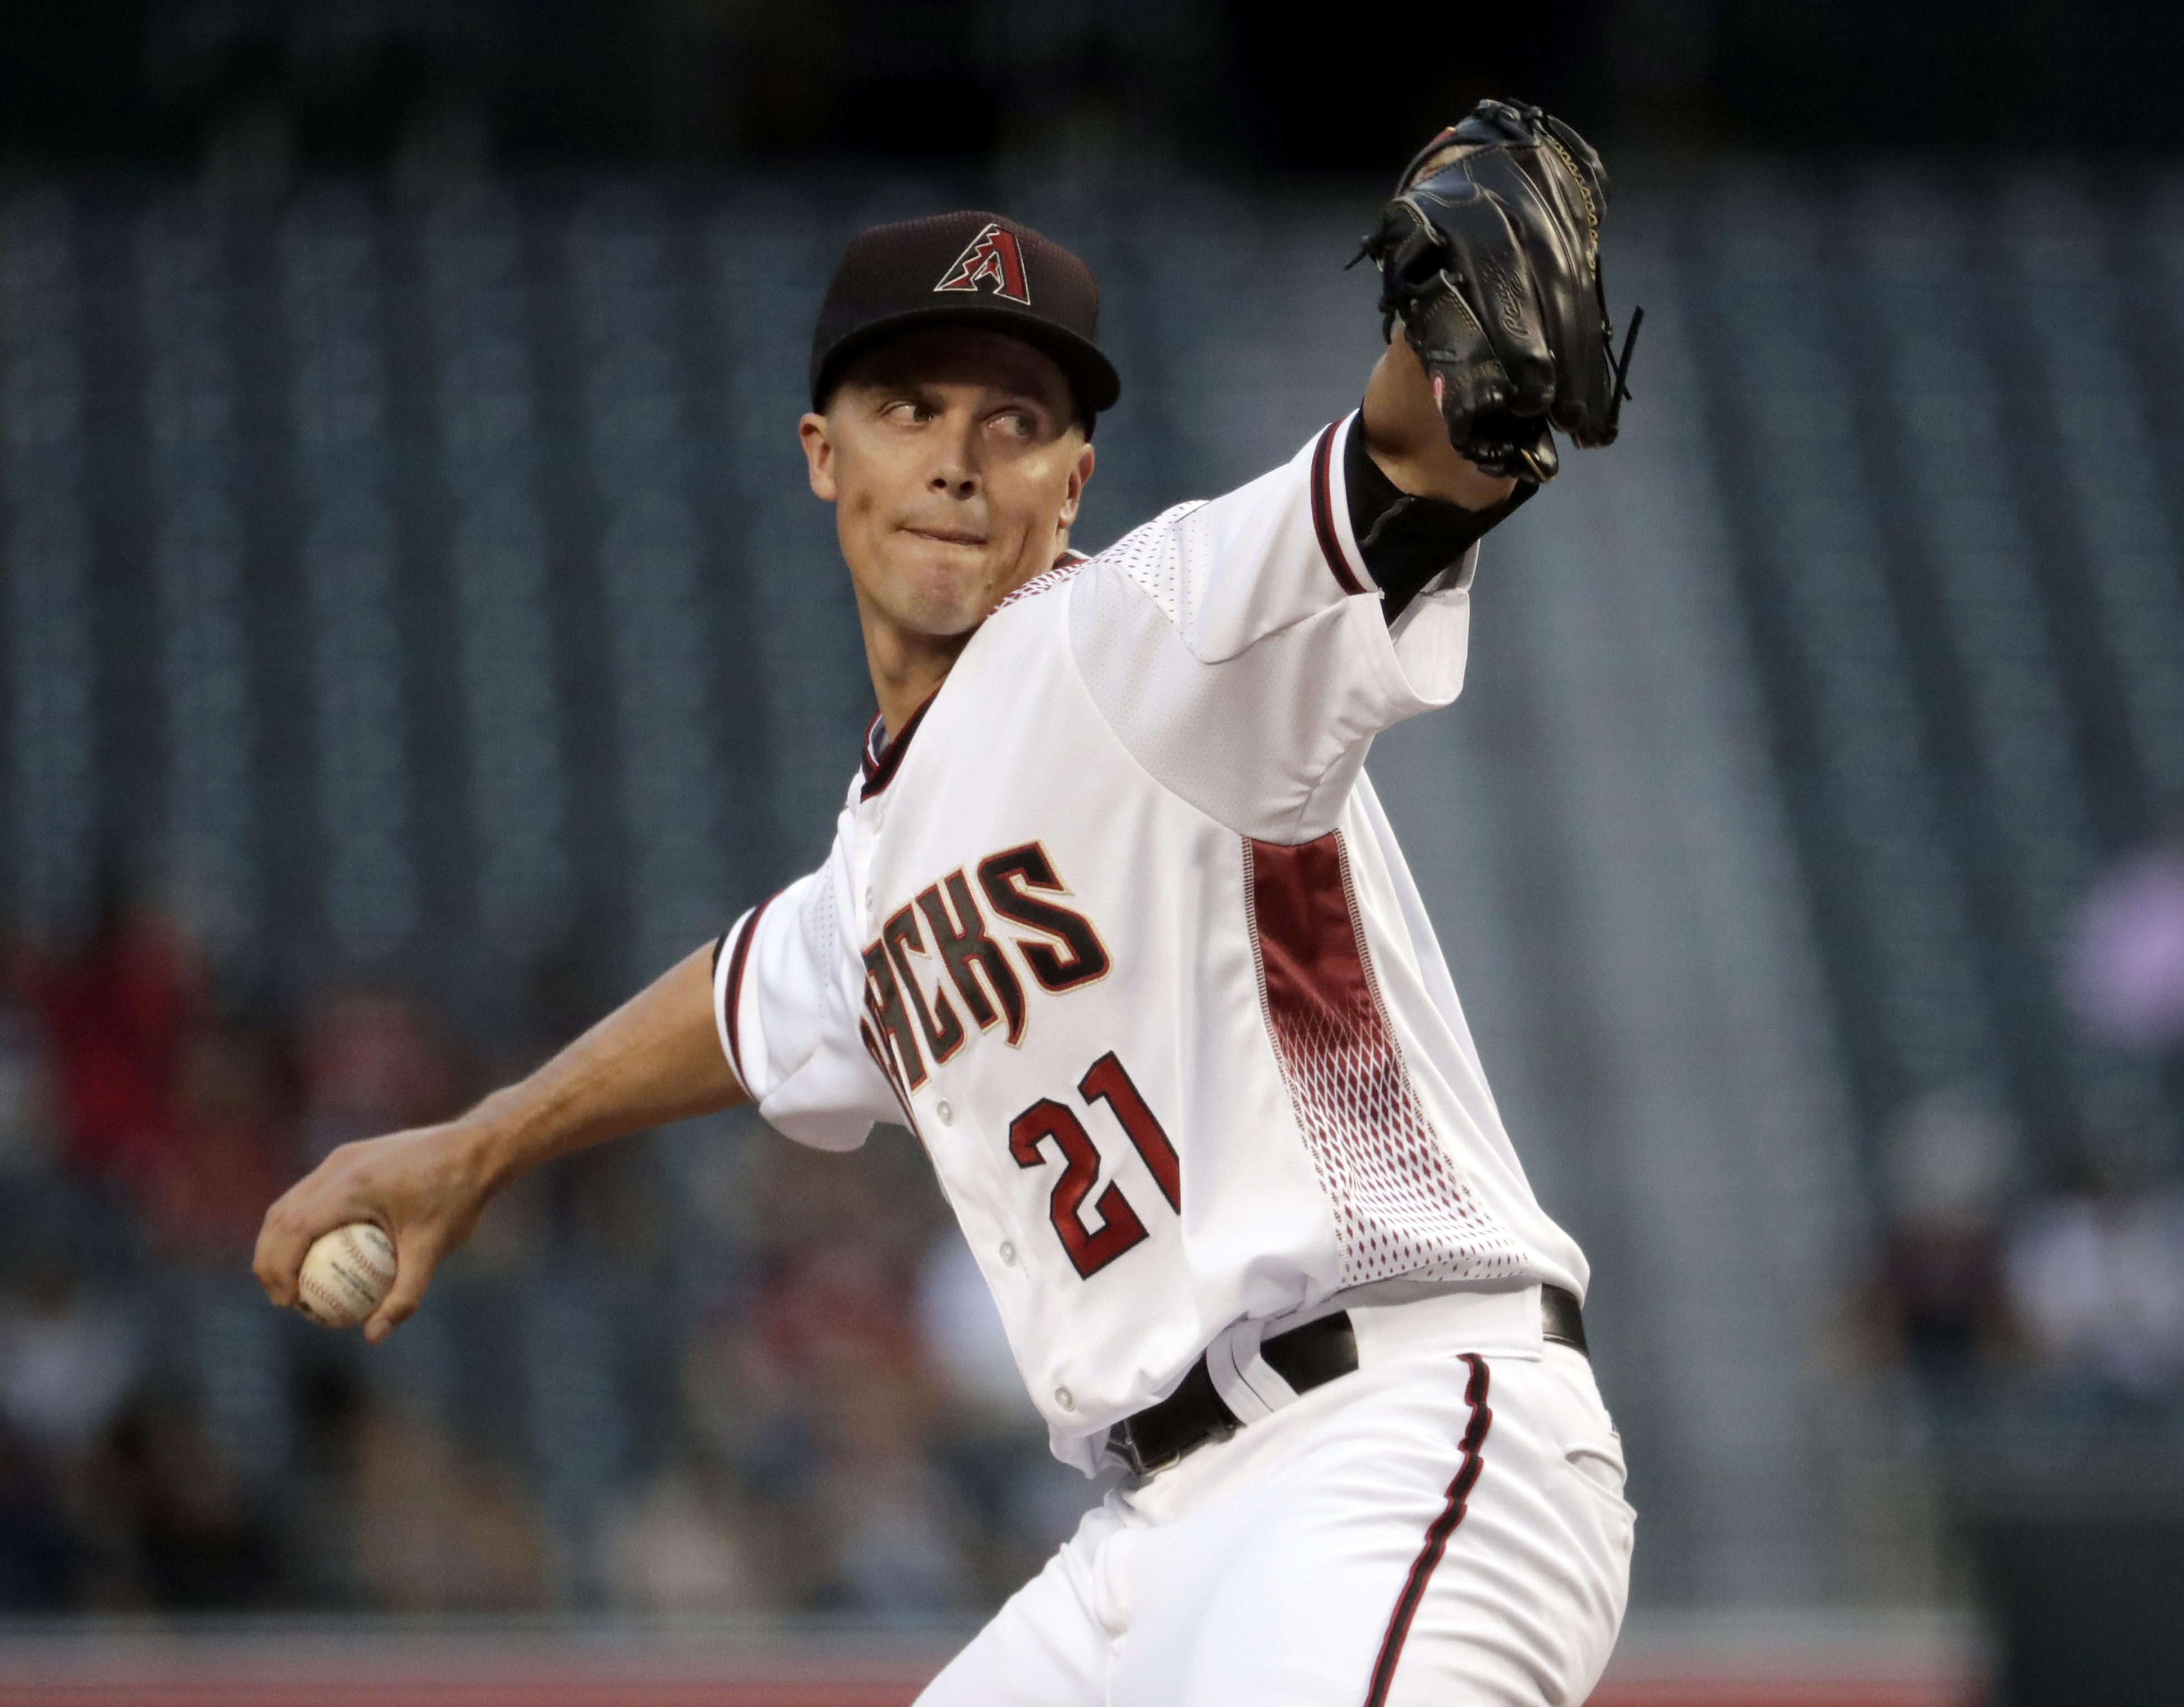 Padres_diamondbacks_baseball_01052